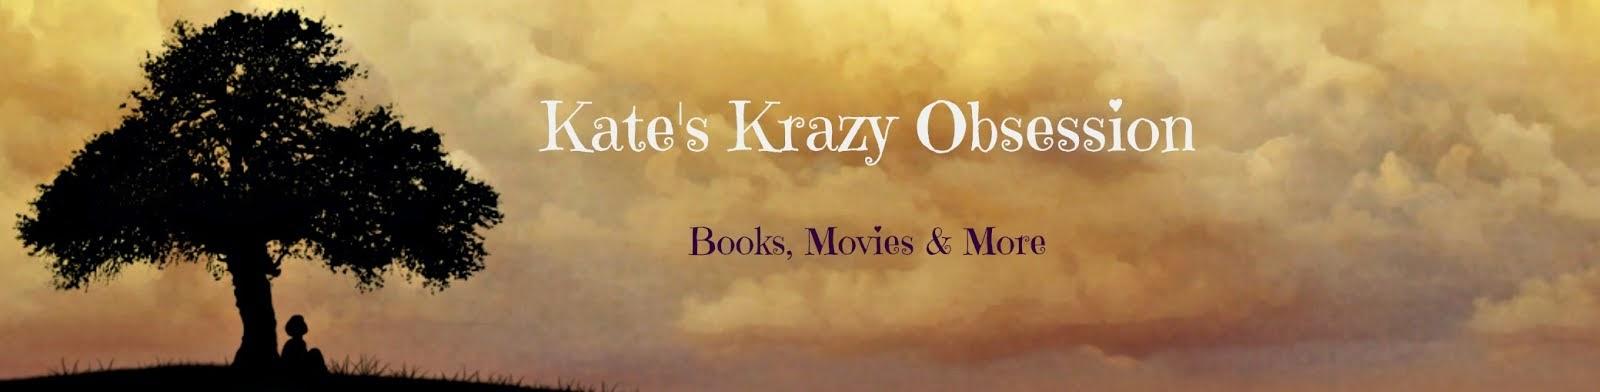 Kate's Krazy Obsession